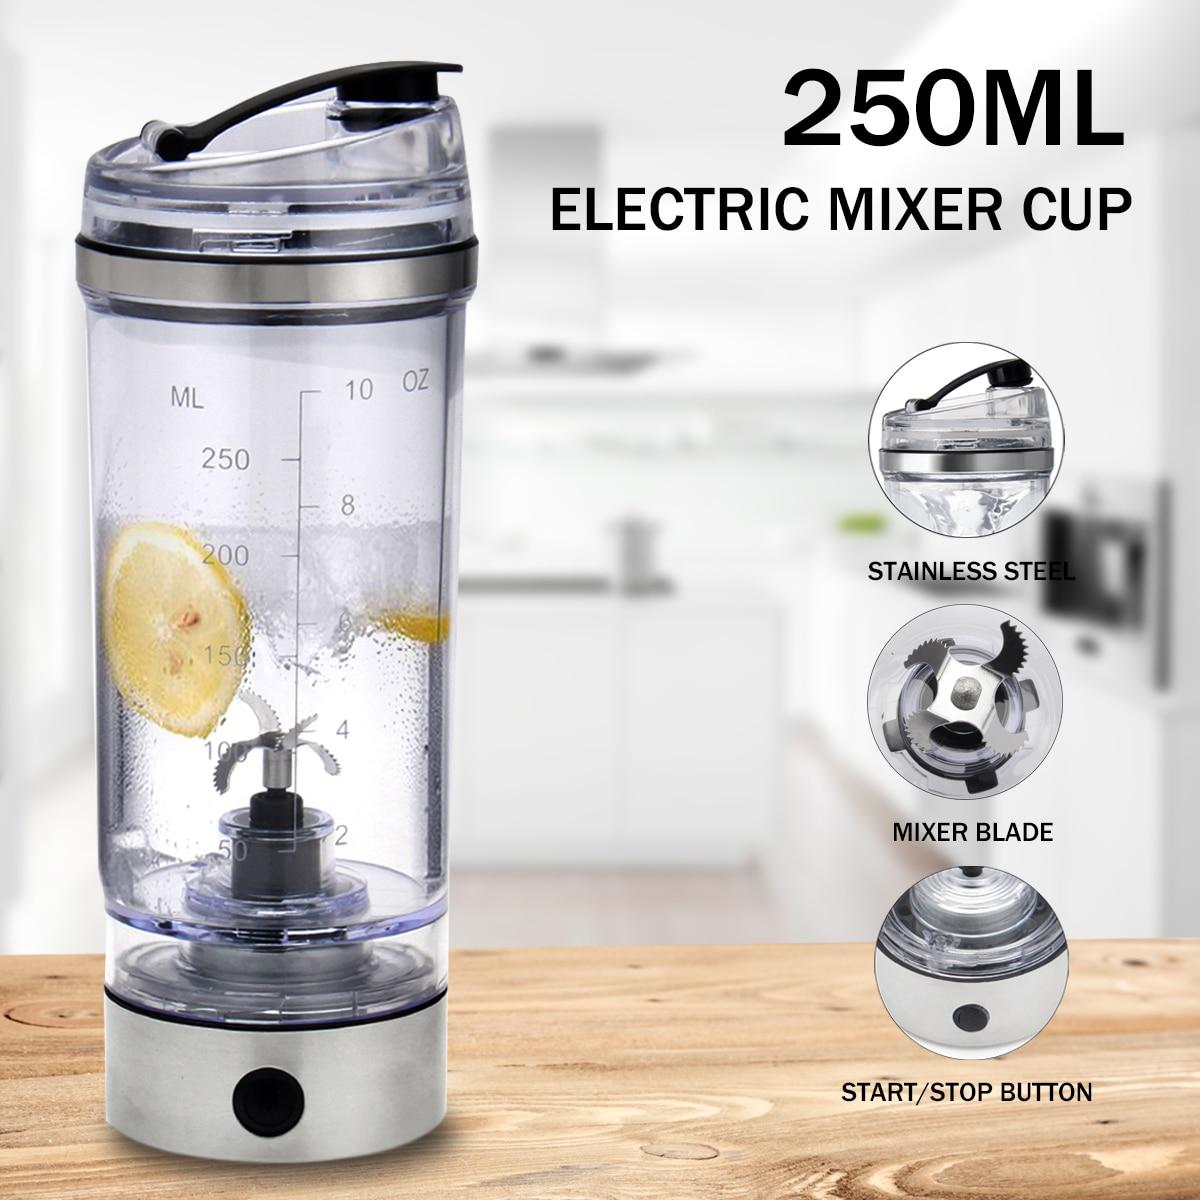 250 мл Электрический протеиновый коктейль мешалка USB коктейль бутылка молока кофе блендер чайник Фитнес вихревой Tornado умный миксер 2020 Новинк...